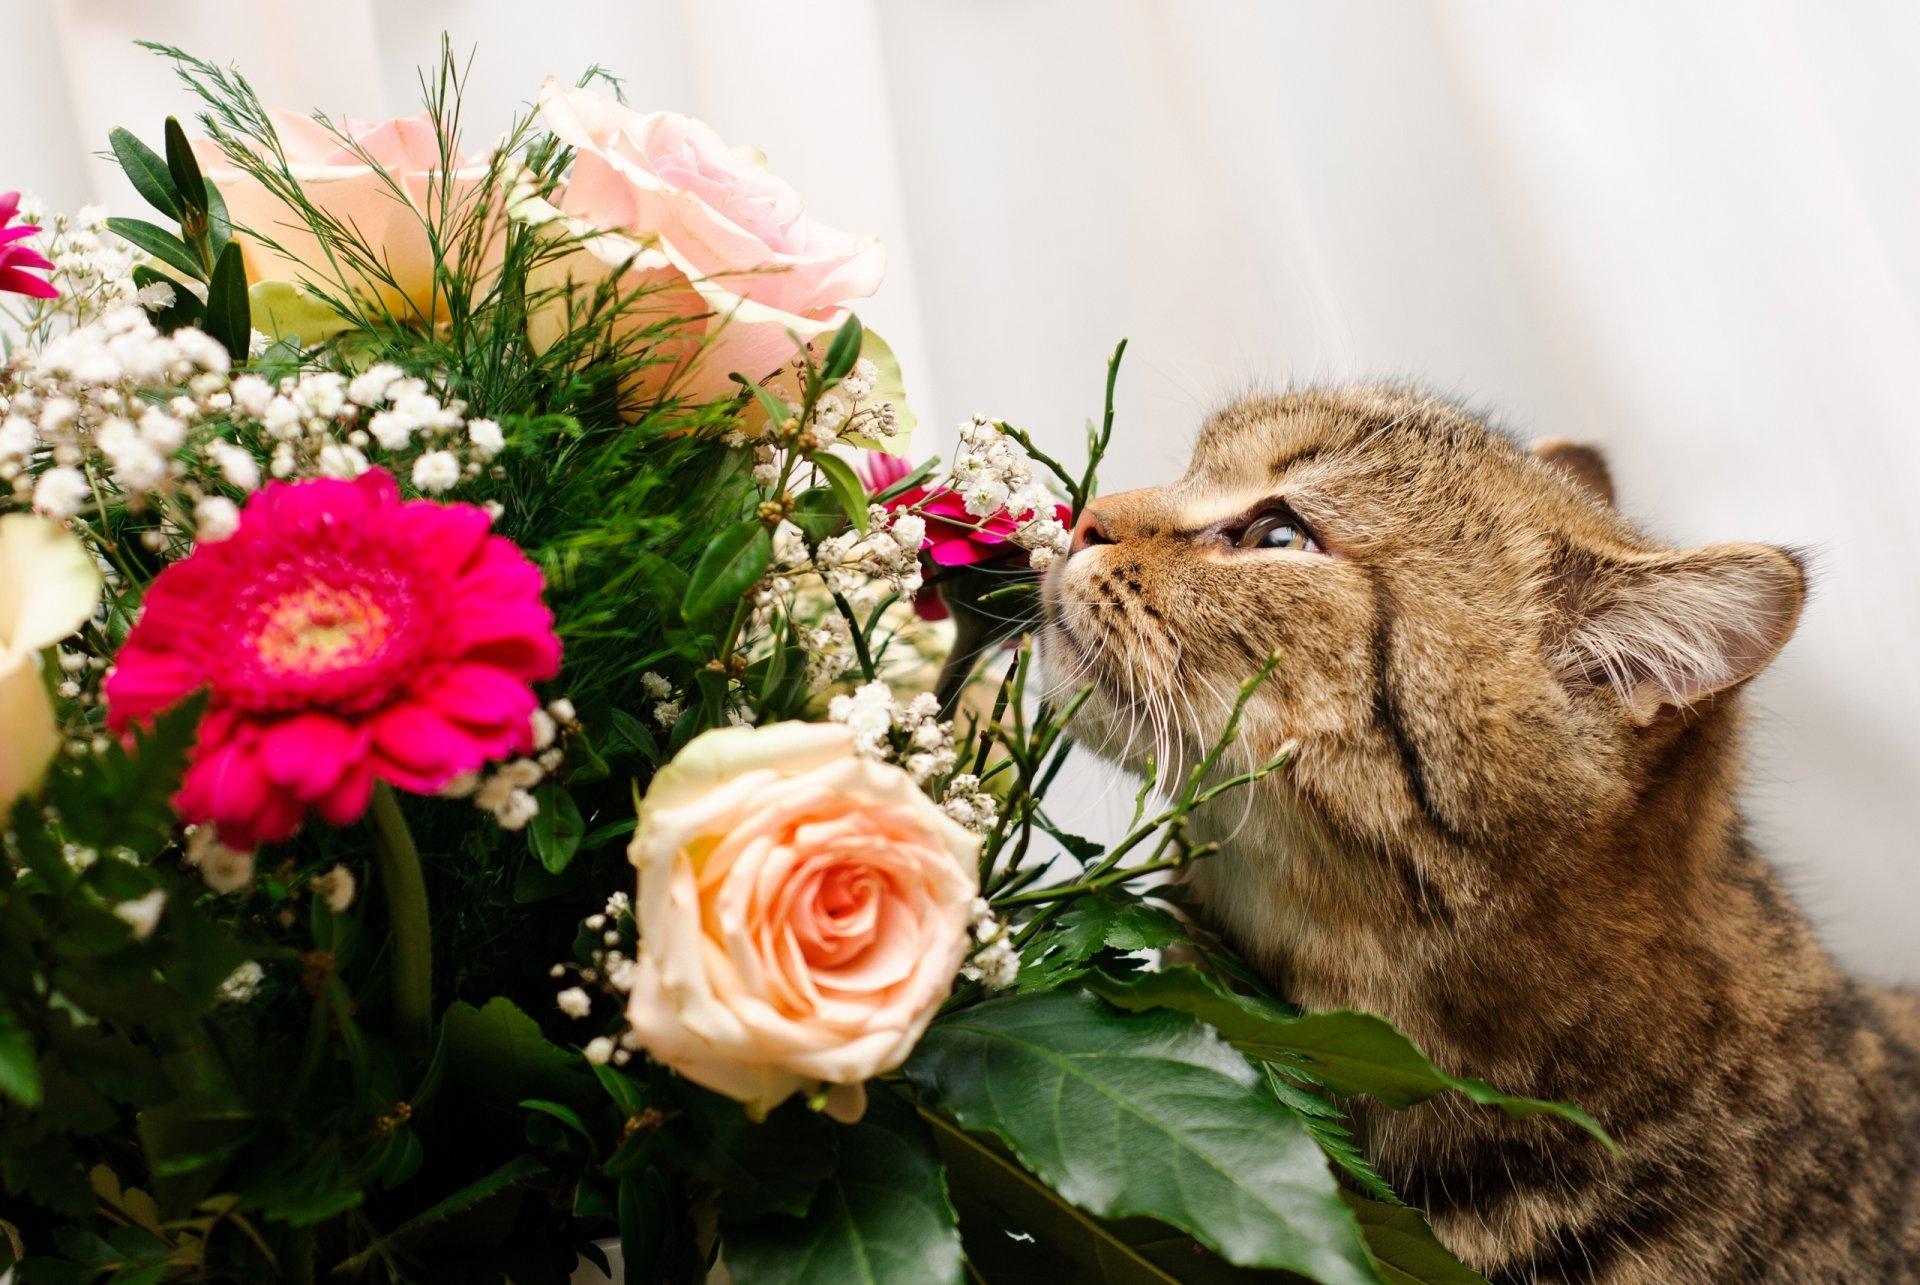 картинки котята с цветами роз кафе открытой